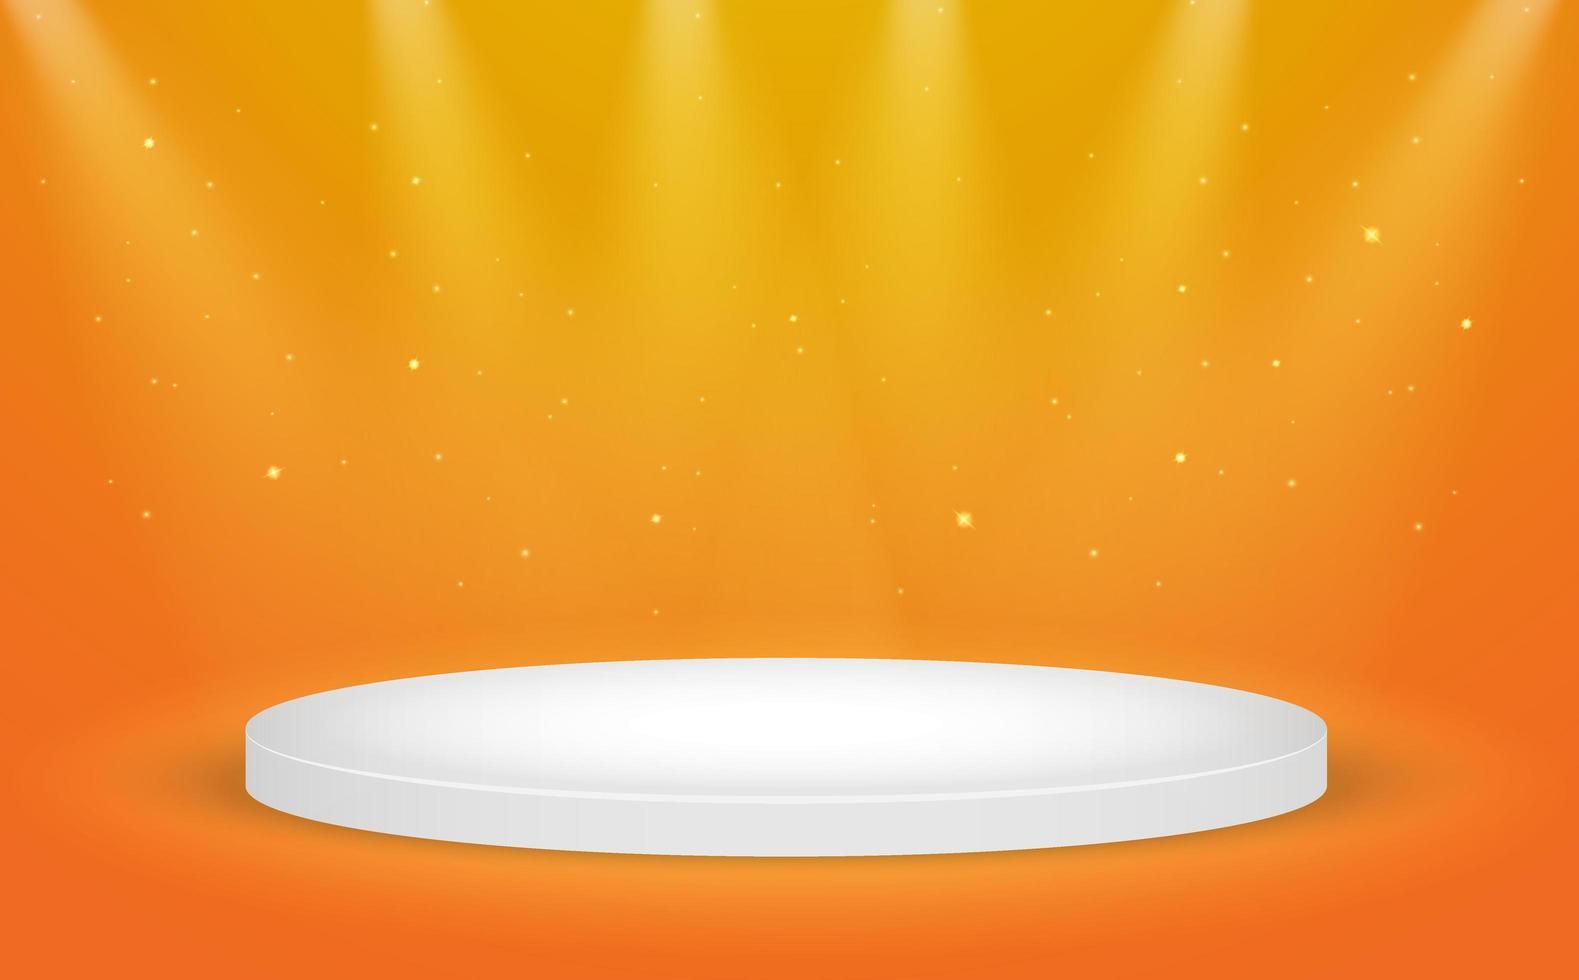 vita runda vinnaren podium på orange vektor